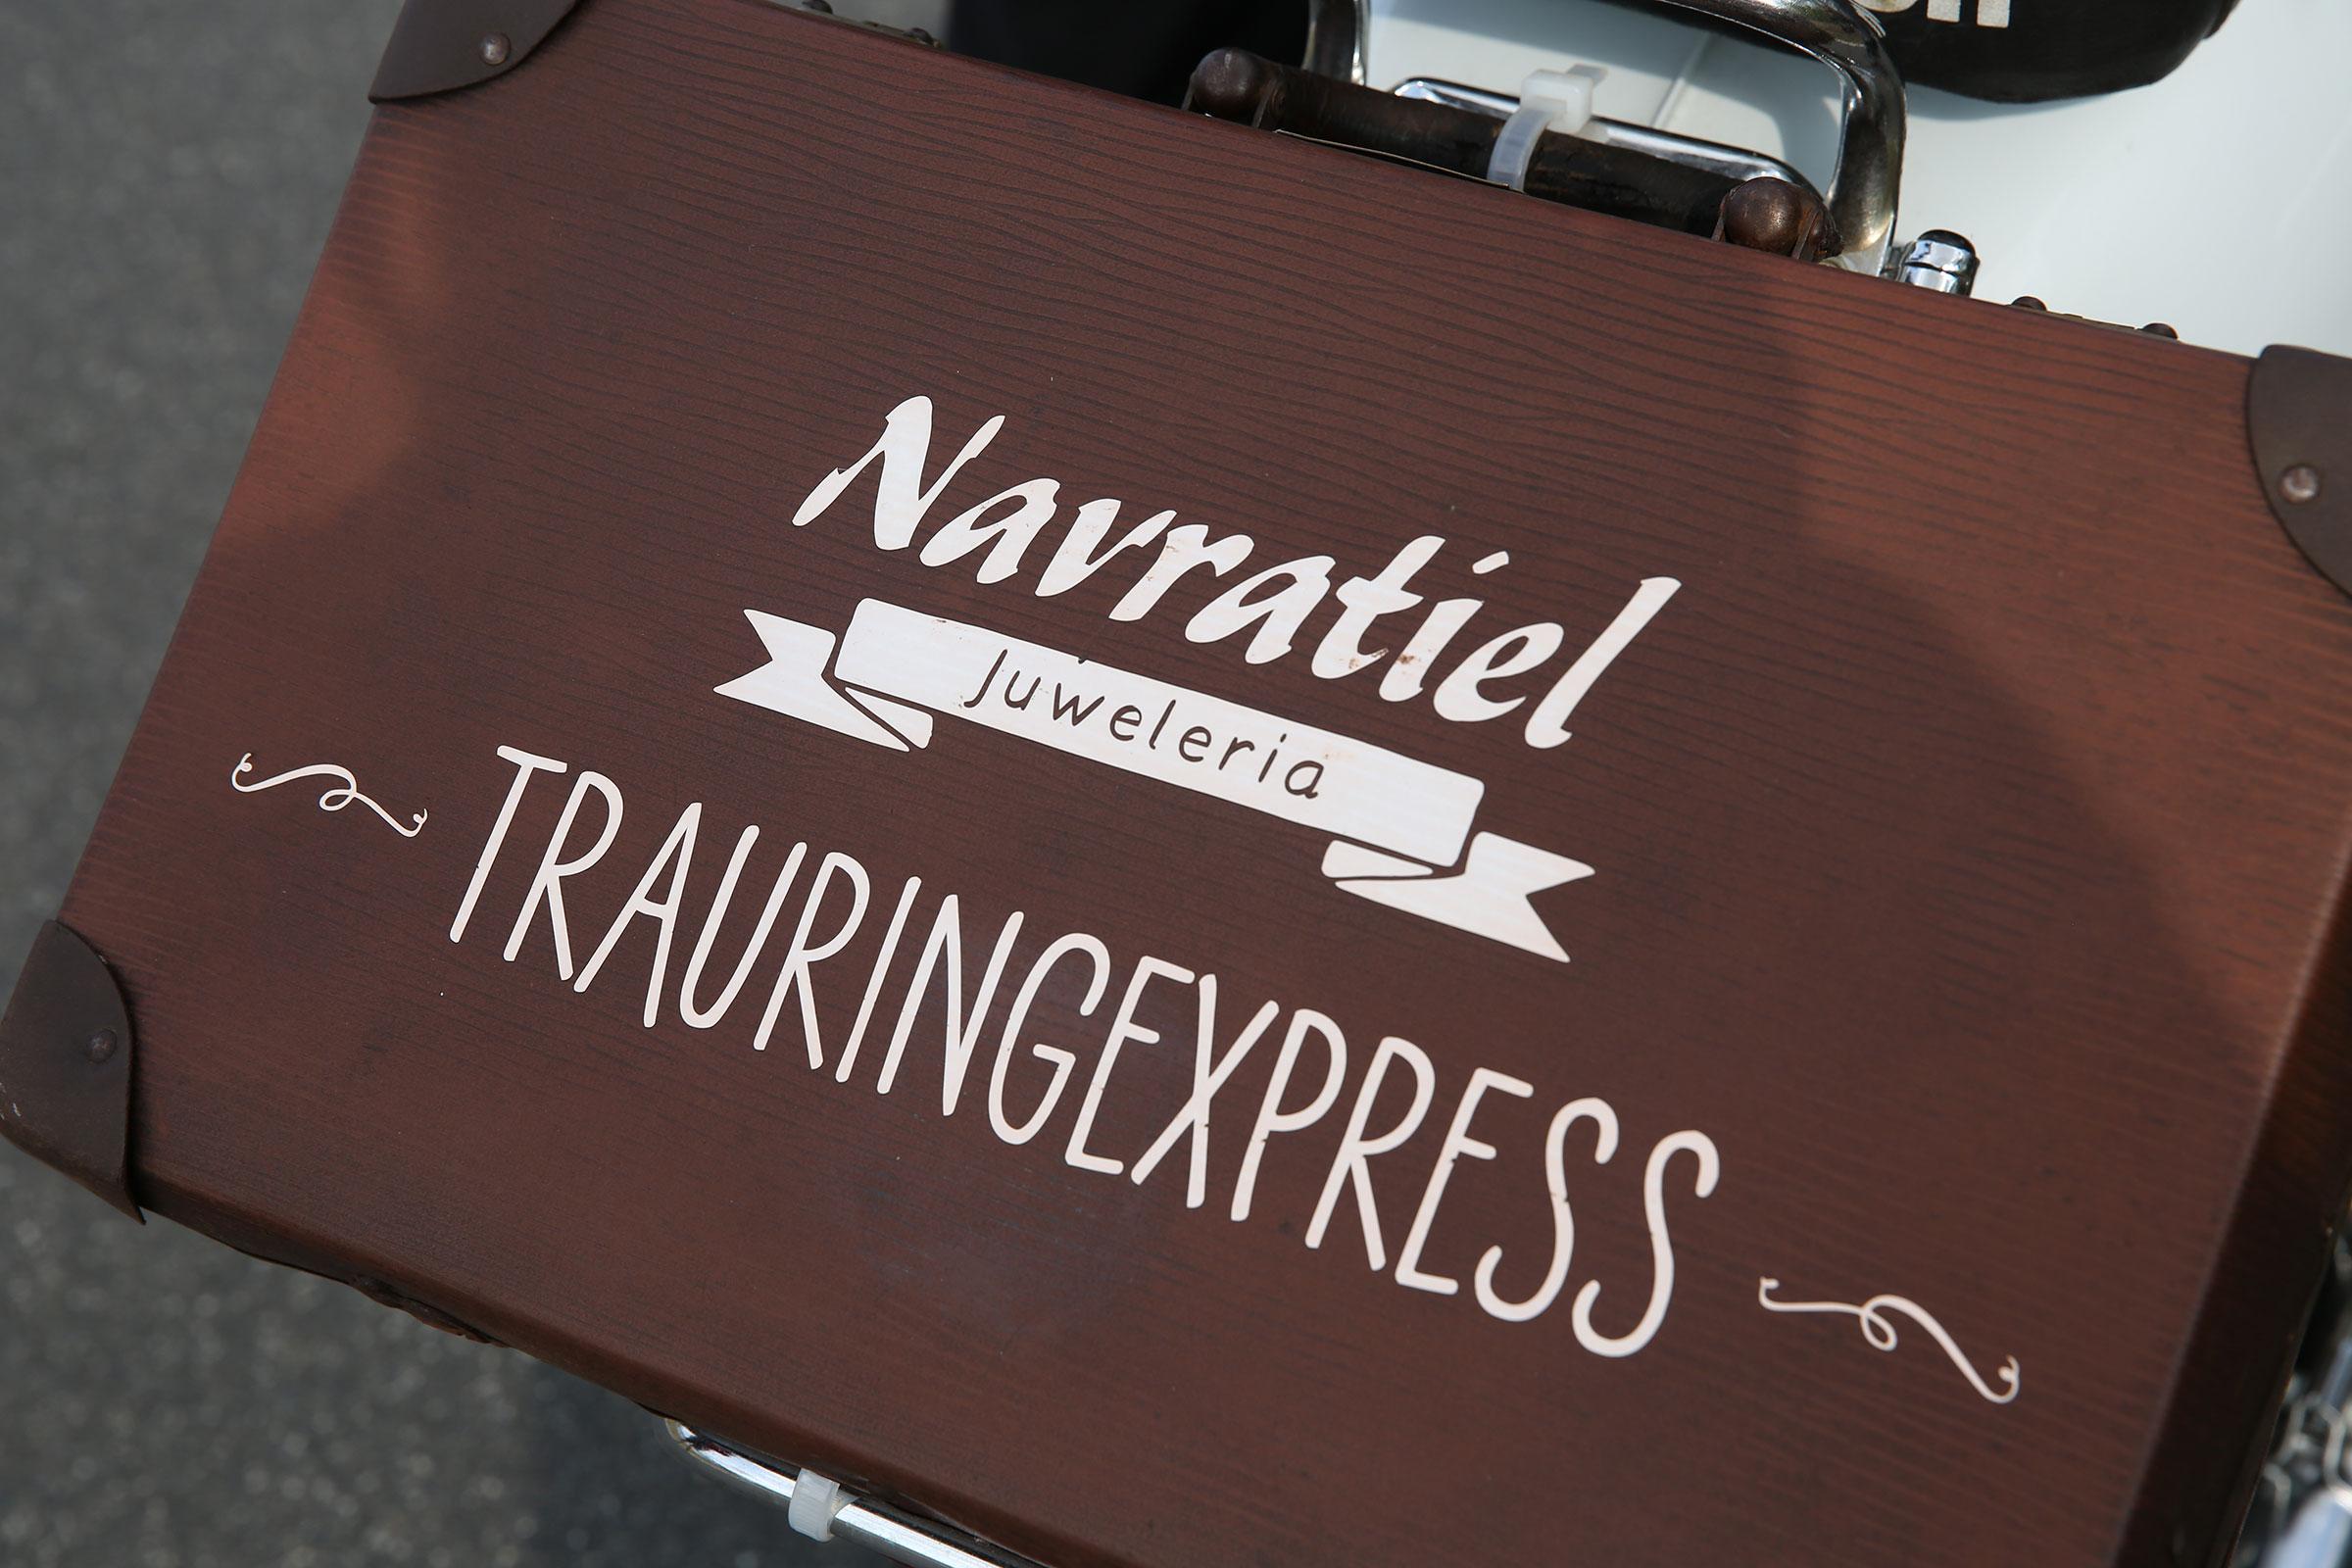 Juweleria_Navratiel_Trauringexpress